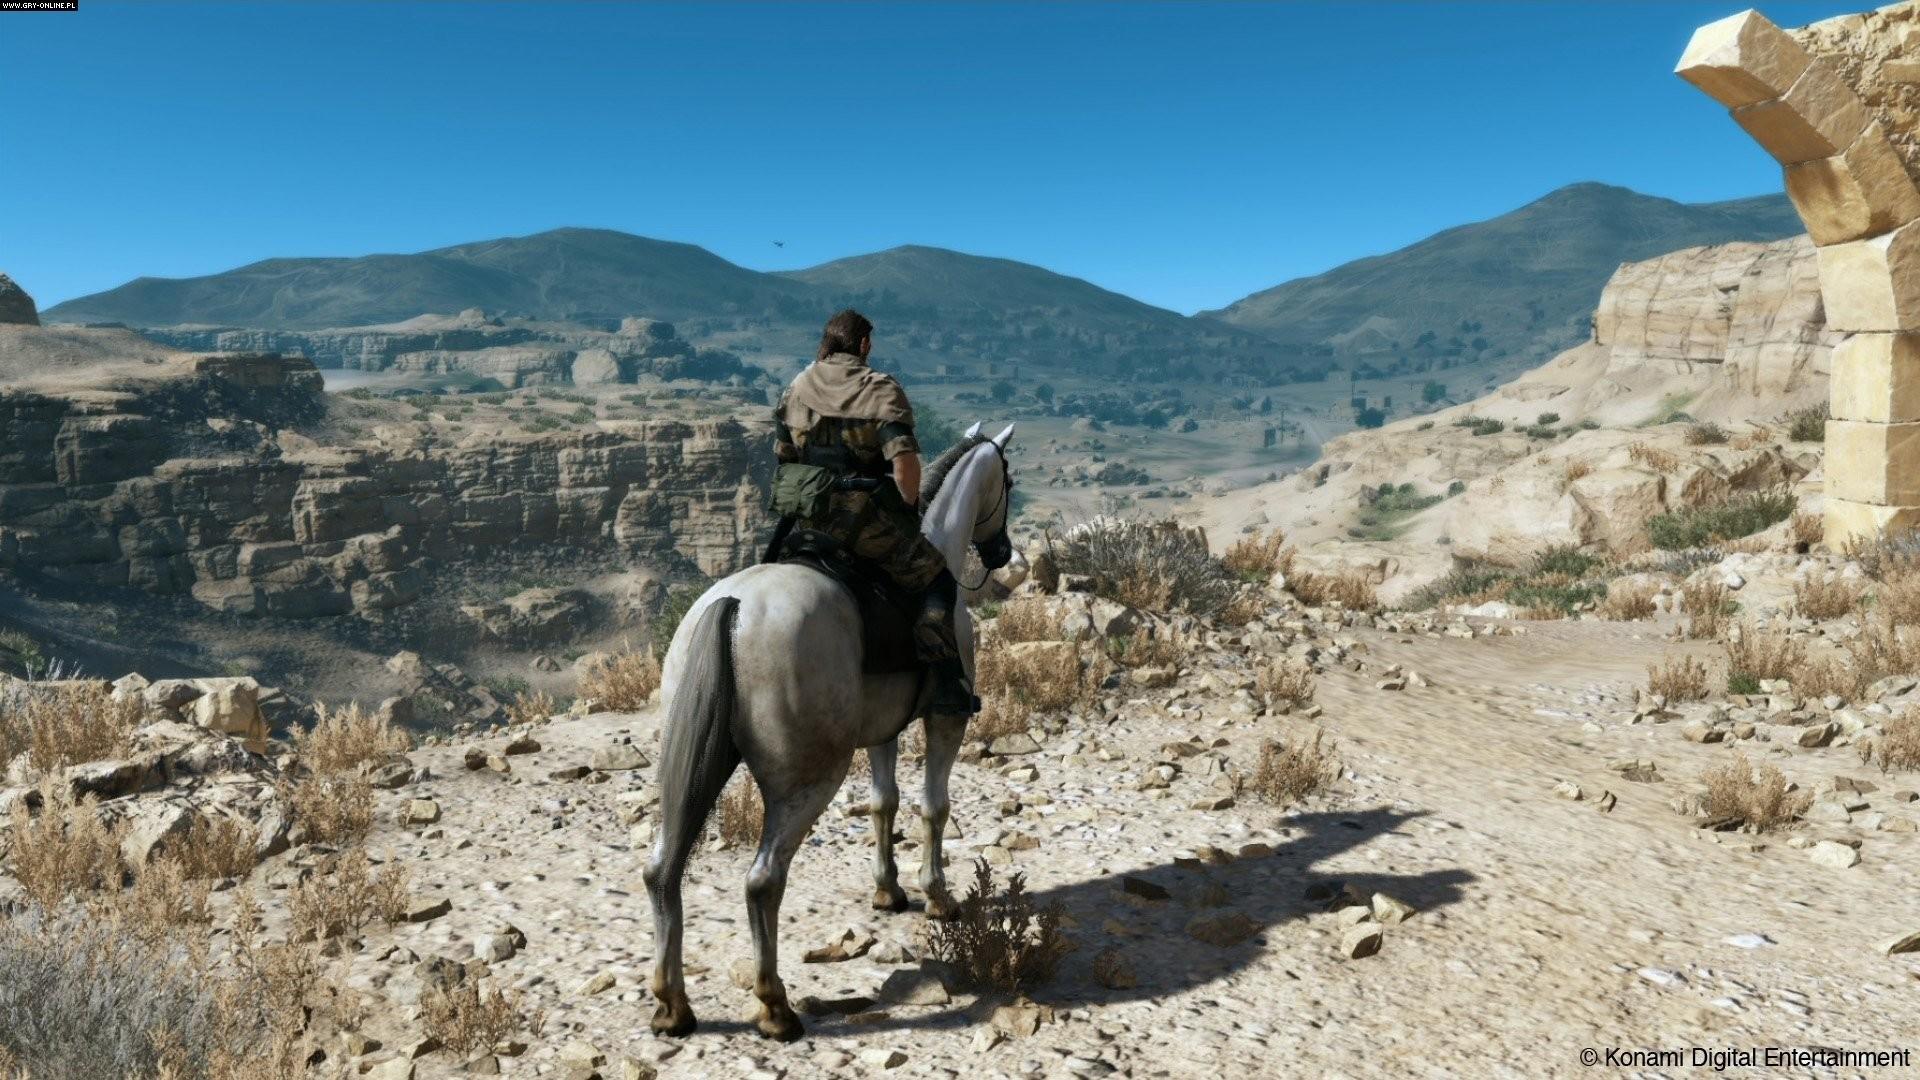 Video Game – Metal Gear Solid V: The Phantom Pain Wallpaper